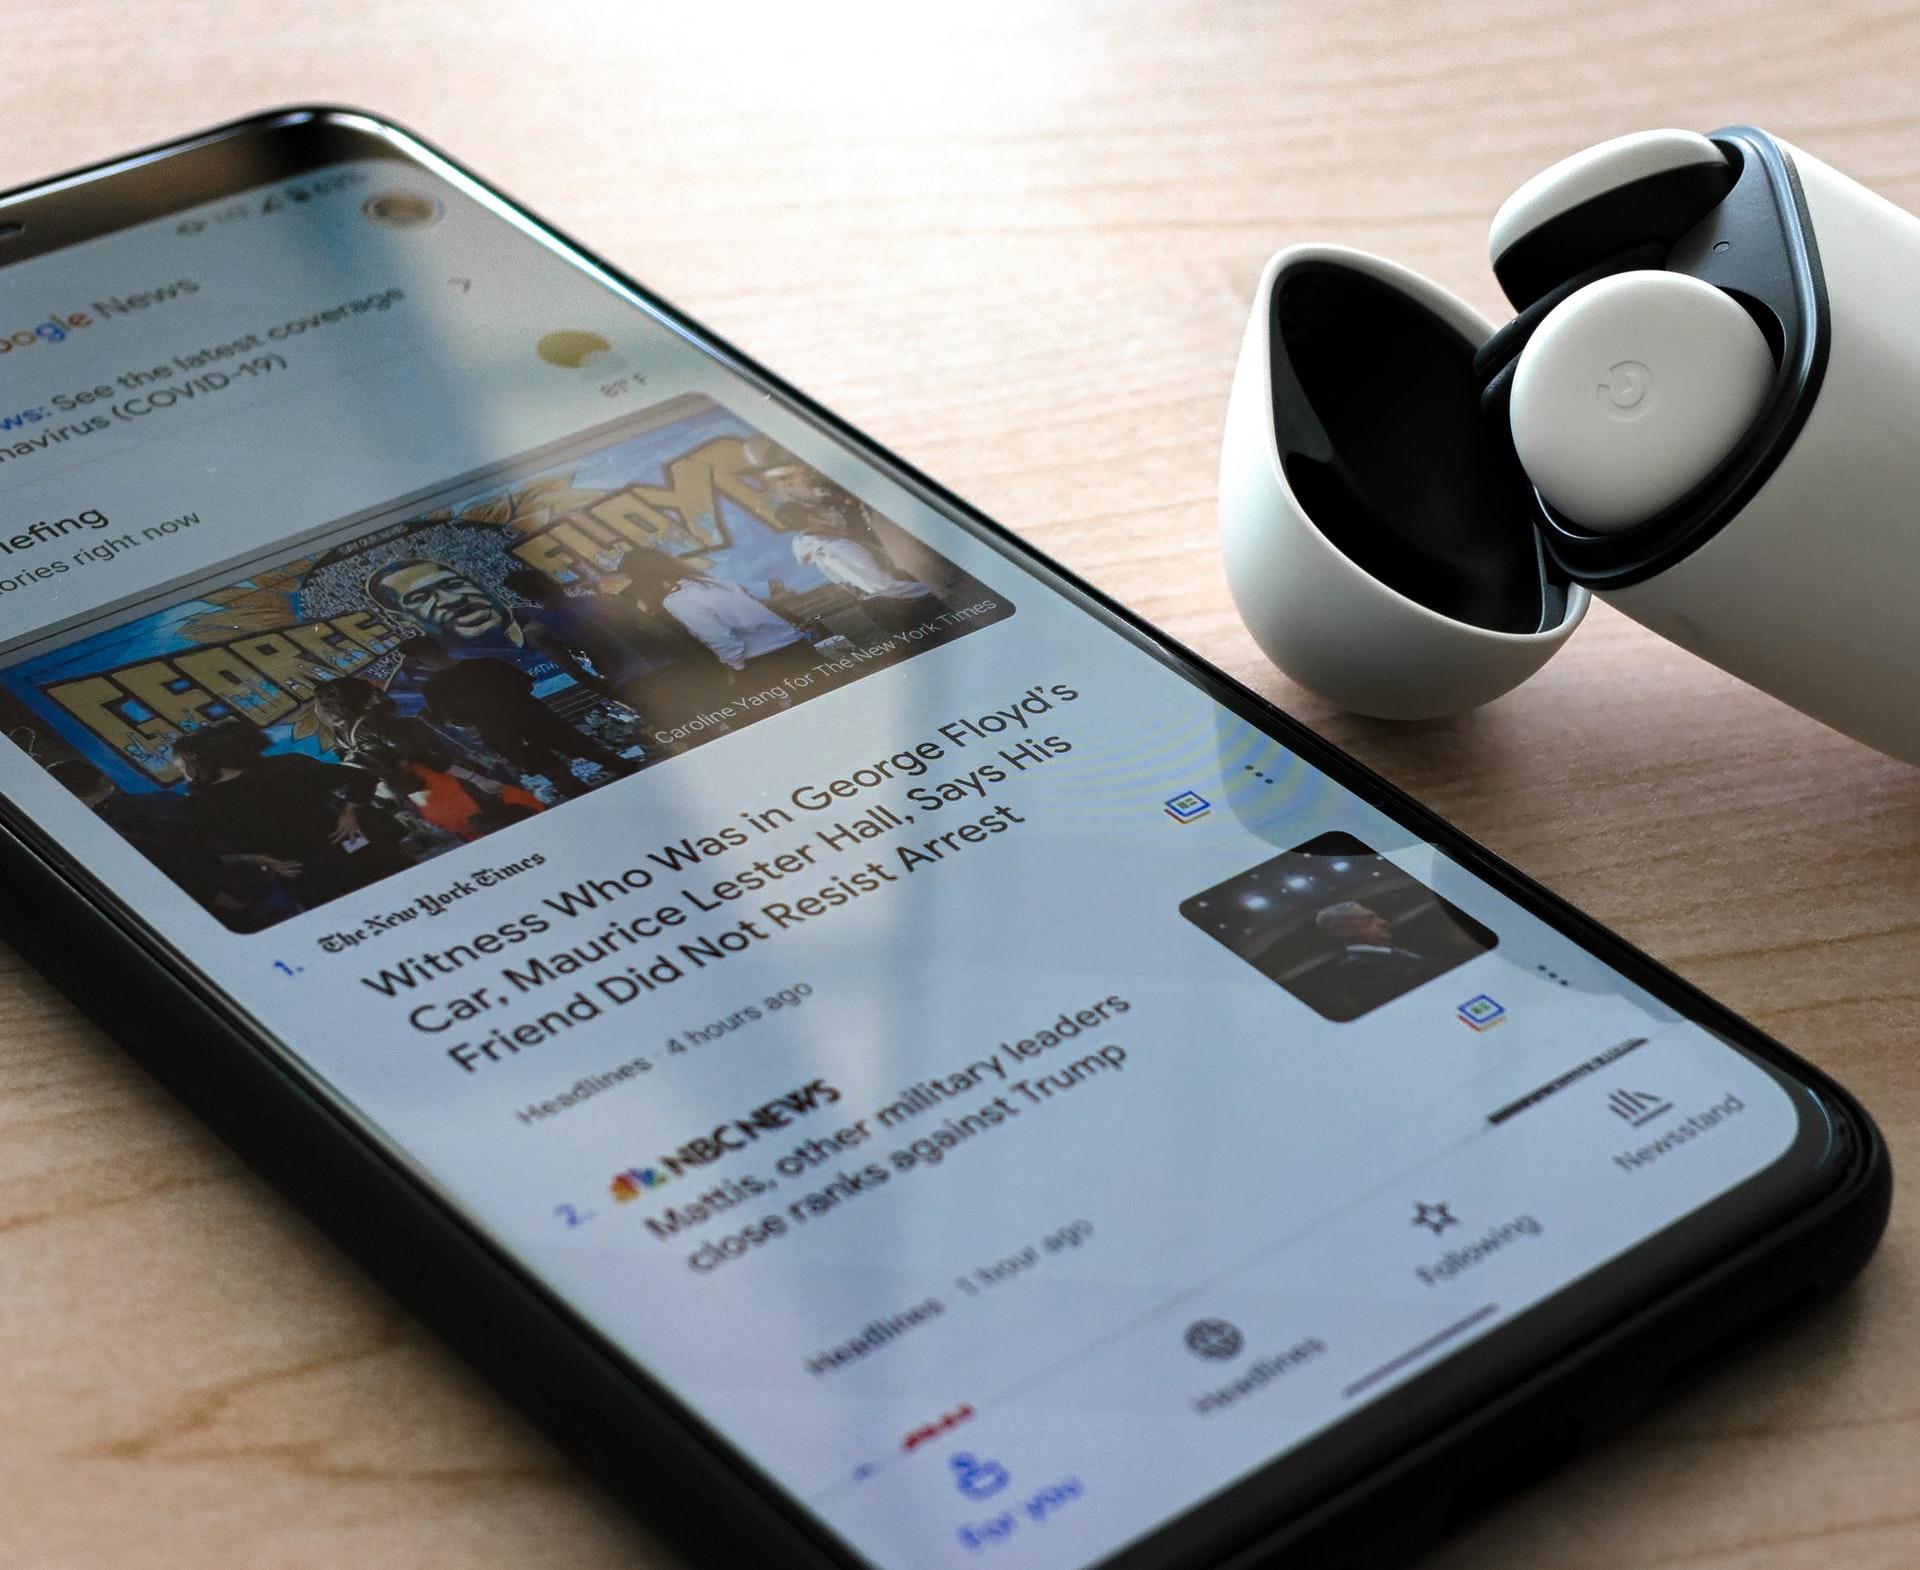 Mobile phoneshowing Google news streams